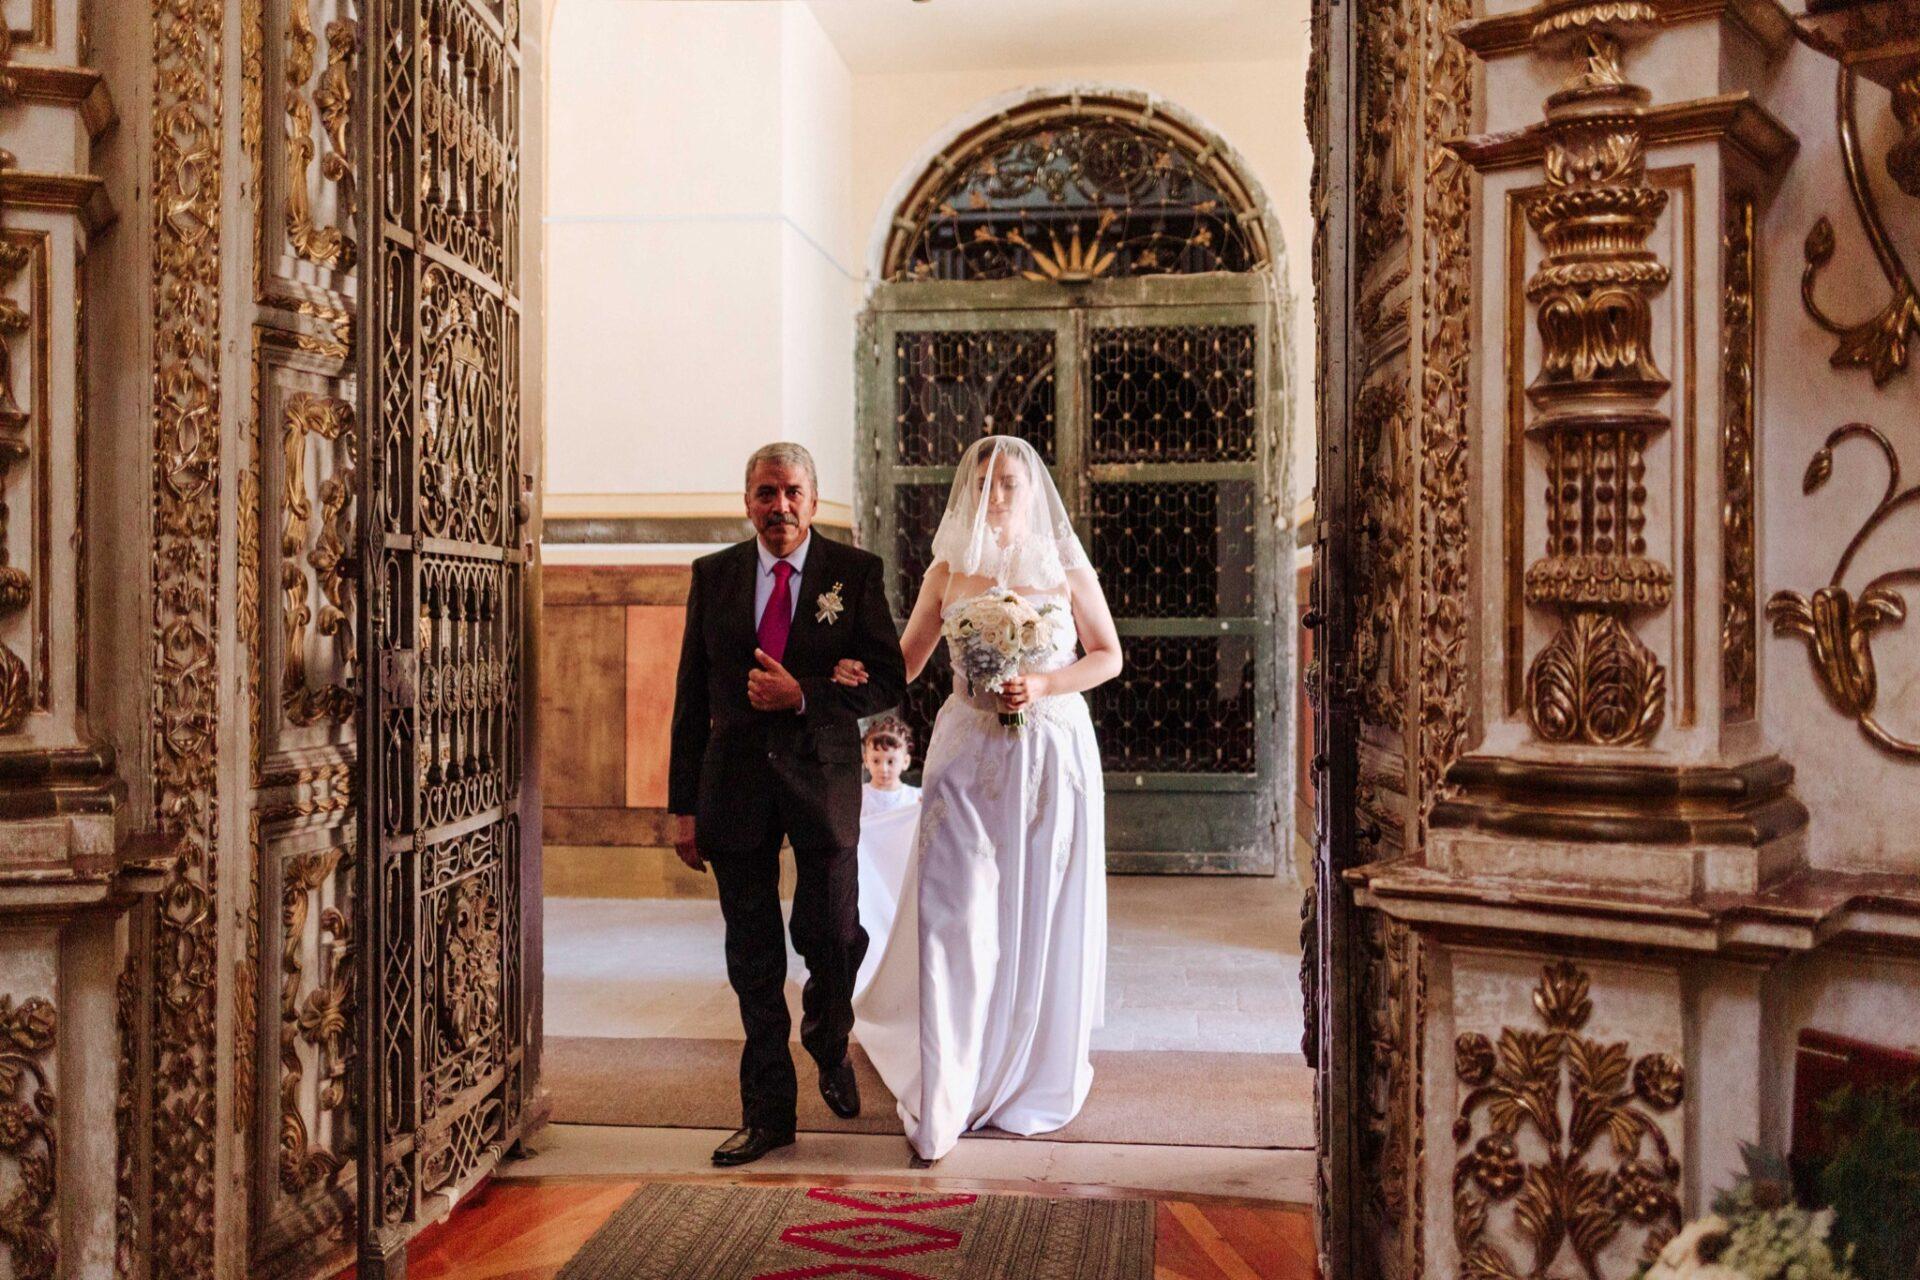 javier_noriega_fotografo_bodas_centro_platero_zacatecas_wedding_photographer4